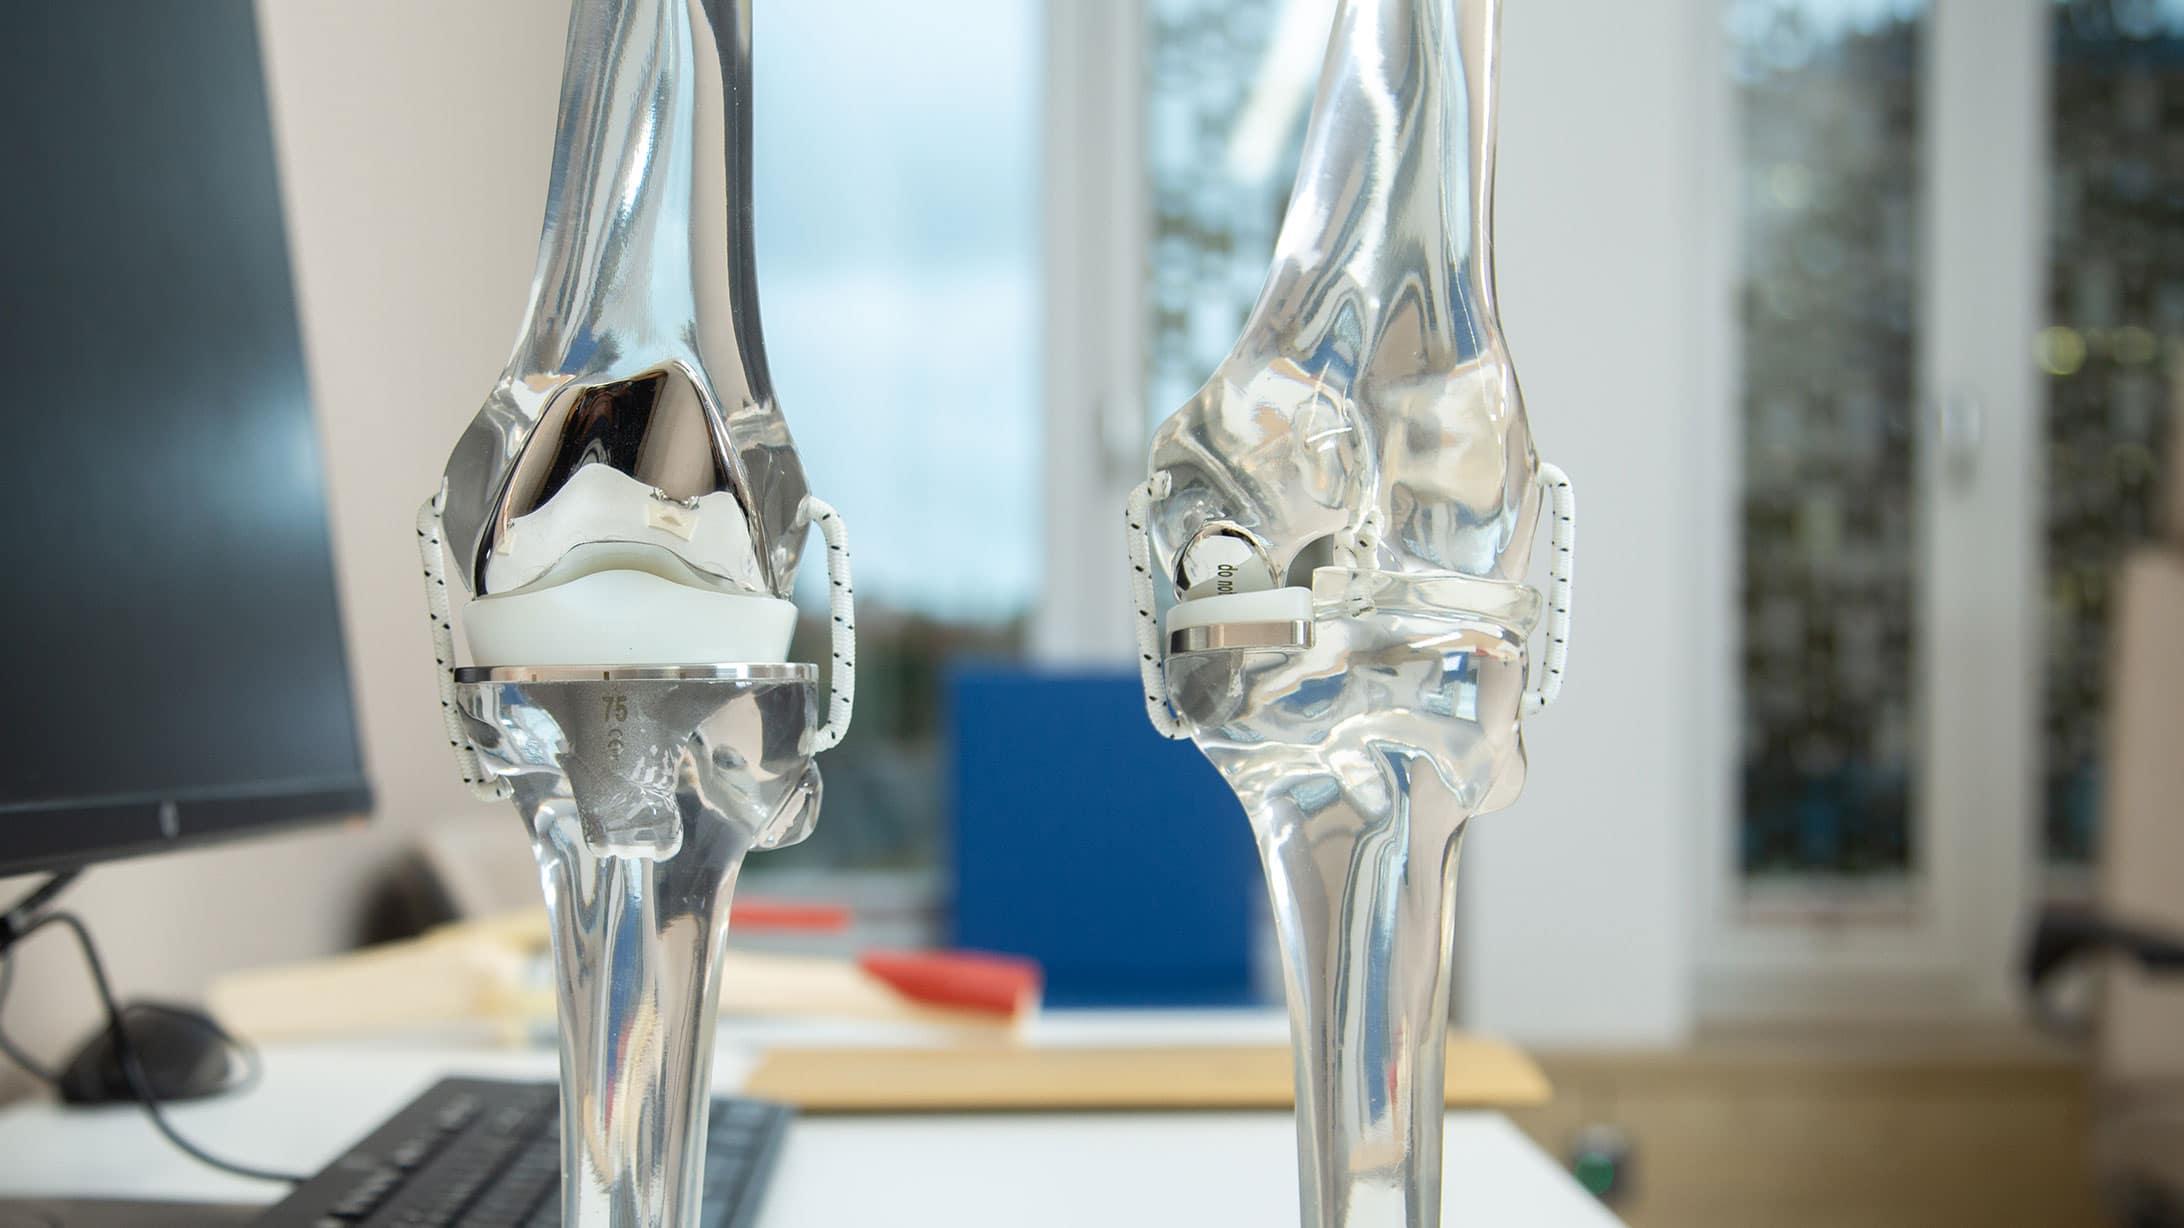 Abbildung zweier Knieprothesen